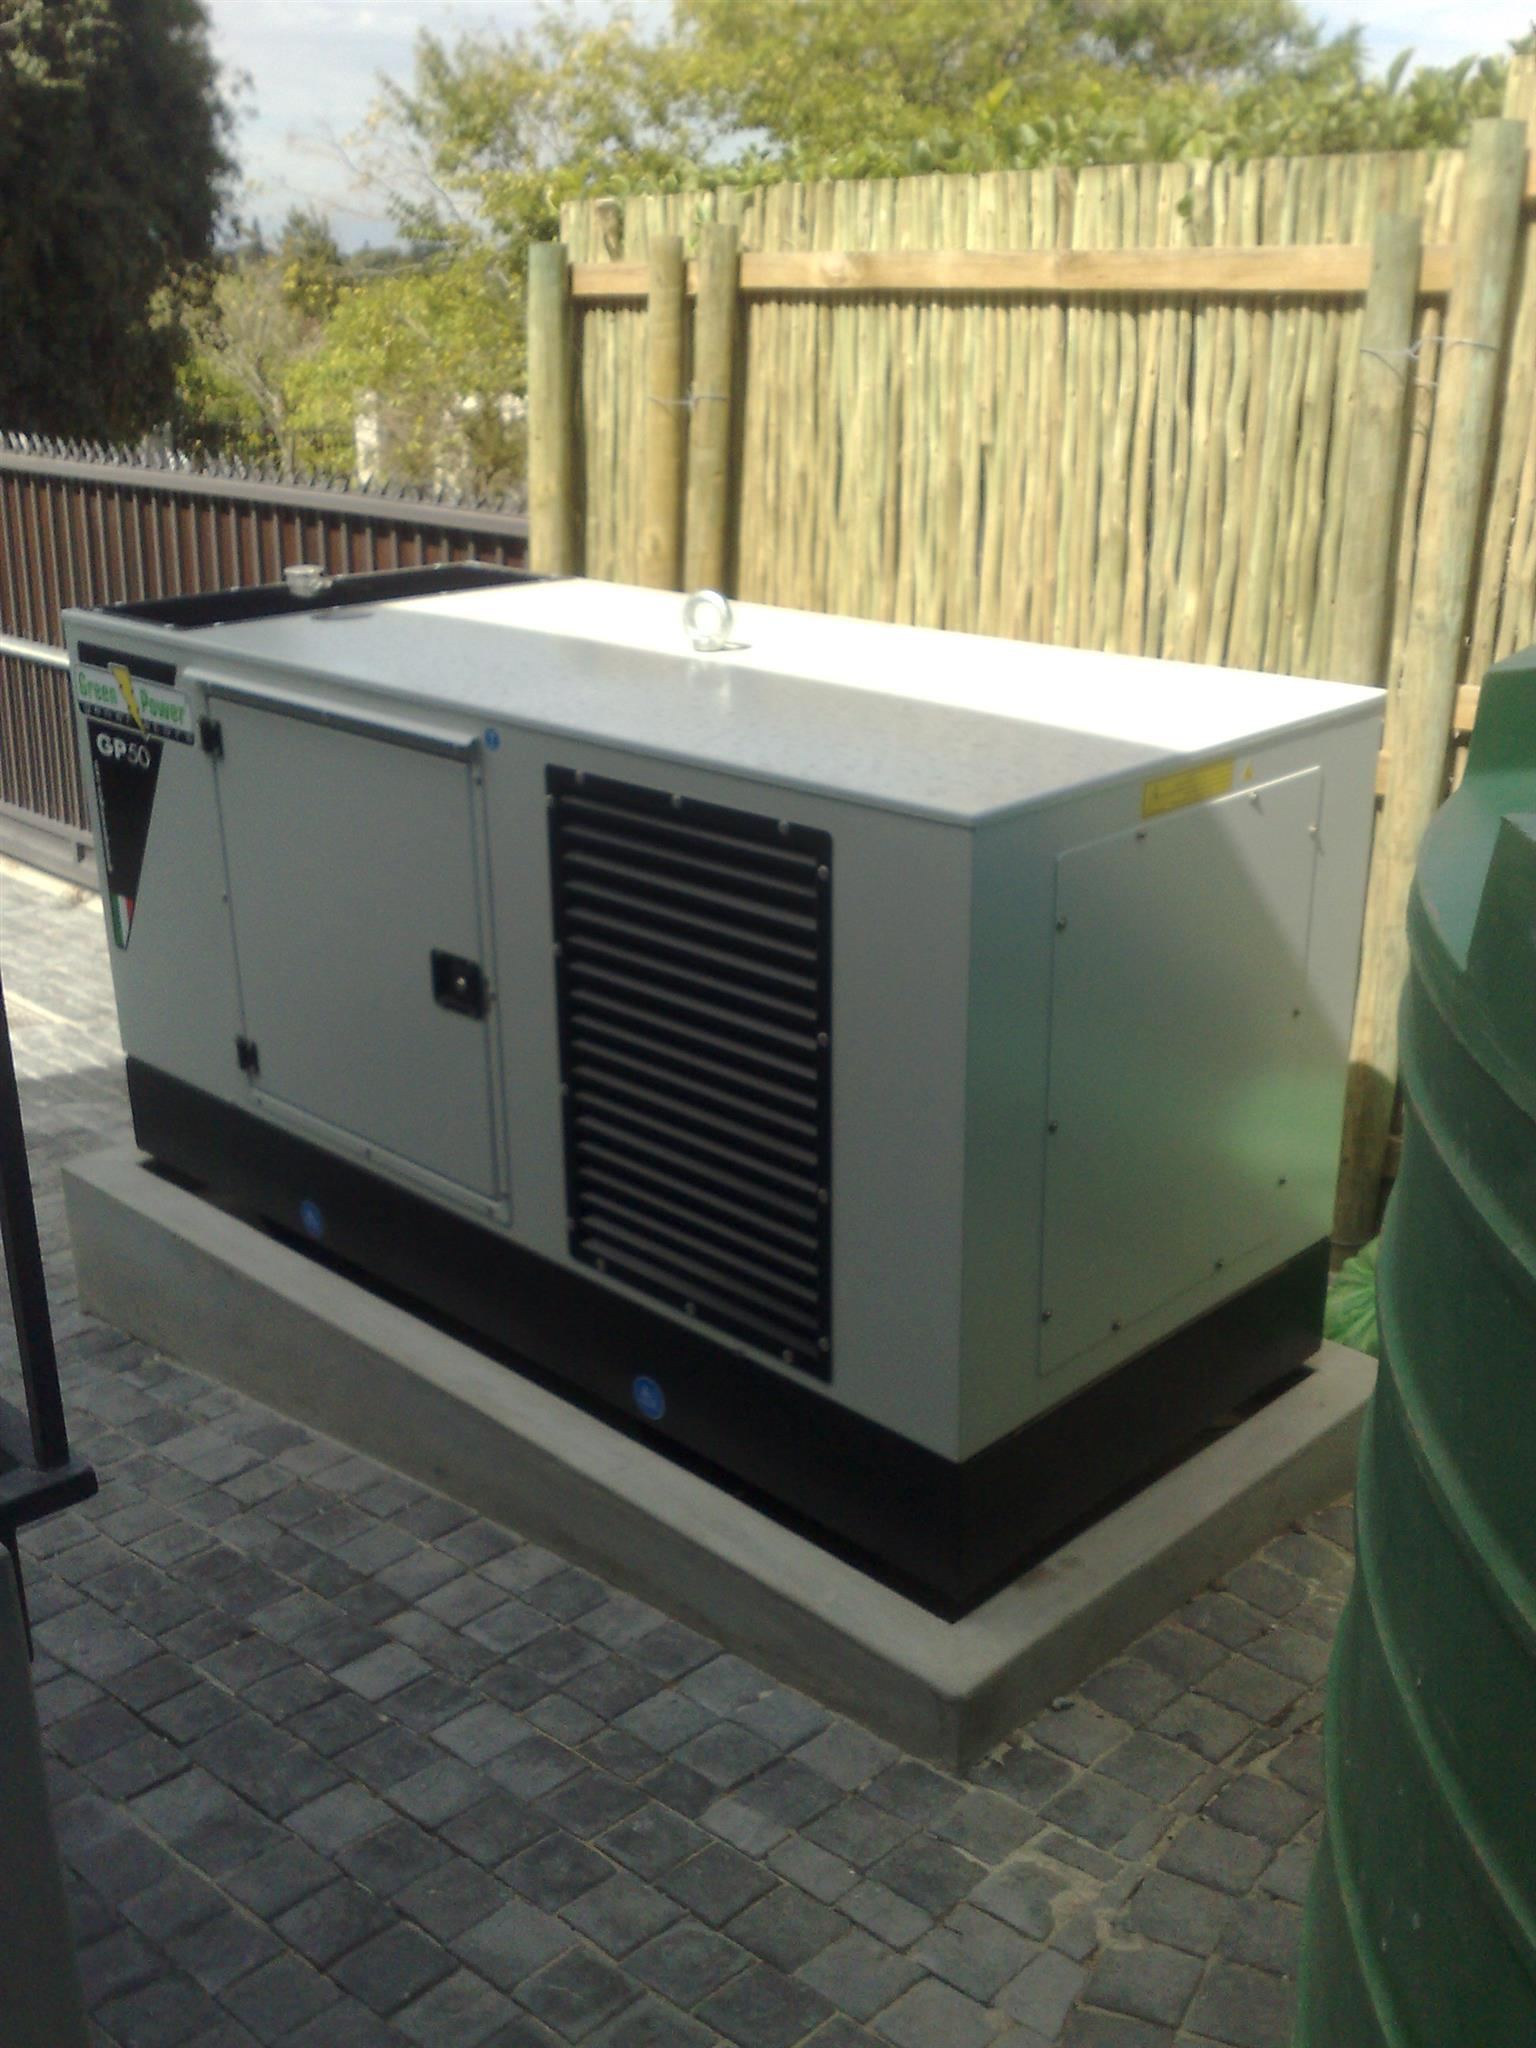 Generator Supply, Service, Repairs, Refueling, Monitoring & Management